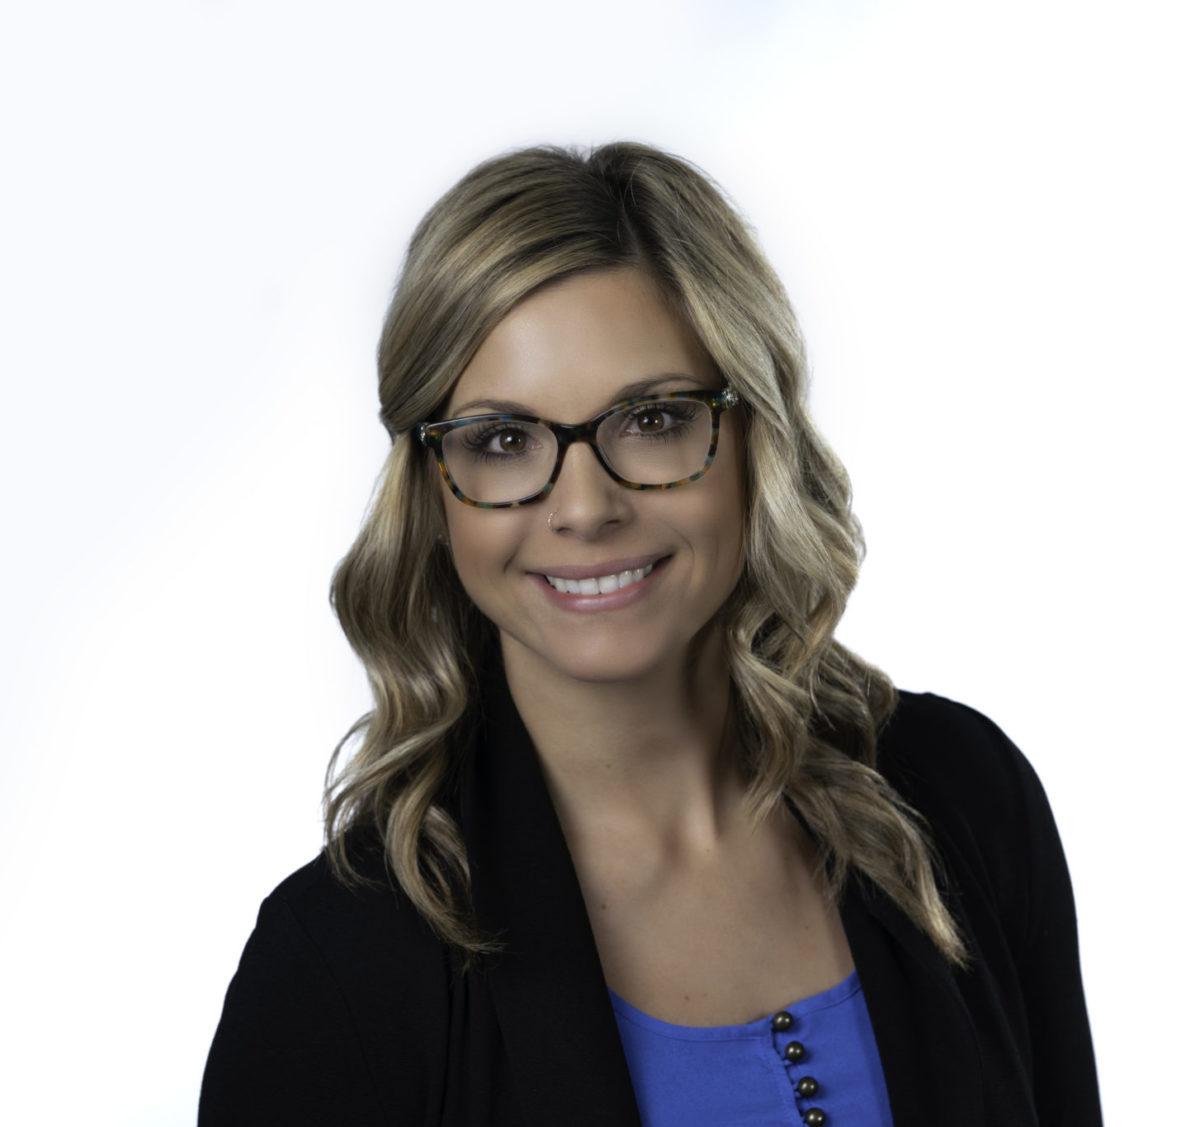 Megan Zacher Amy Stockberger Real Estate Sioux Falls Realtors You Can Trust